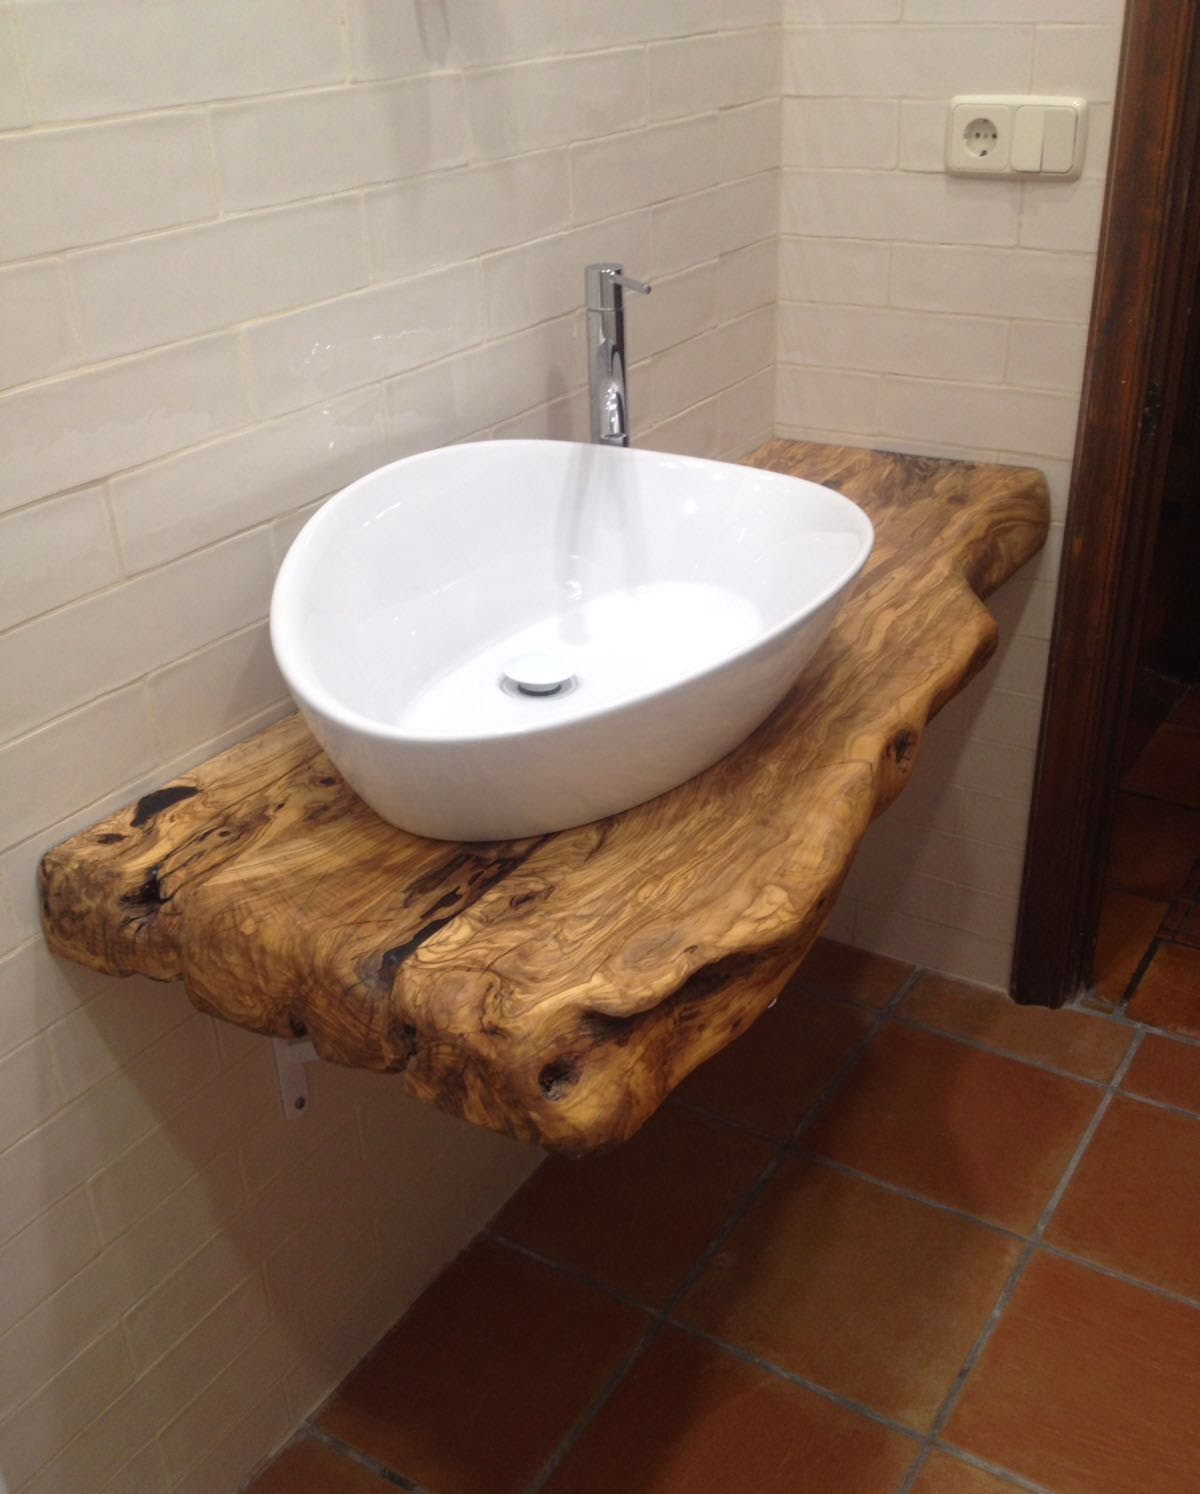 Genial encimeras ba o madera fotos de bano de madera a - Encimeras para banos ...